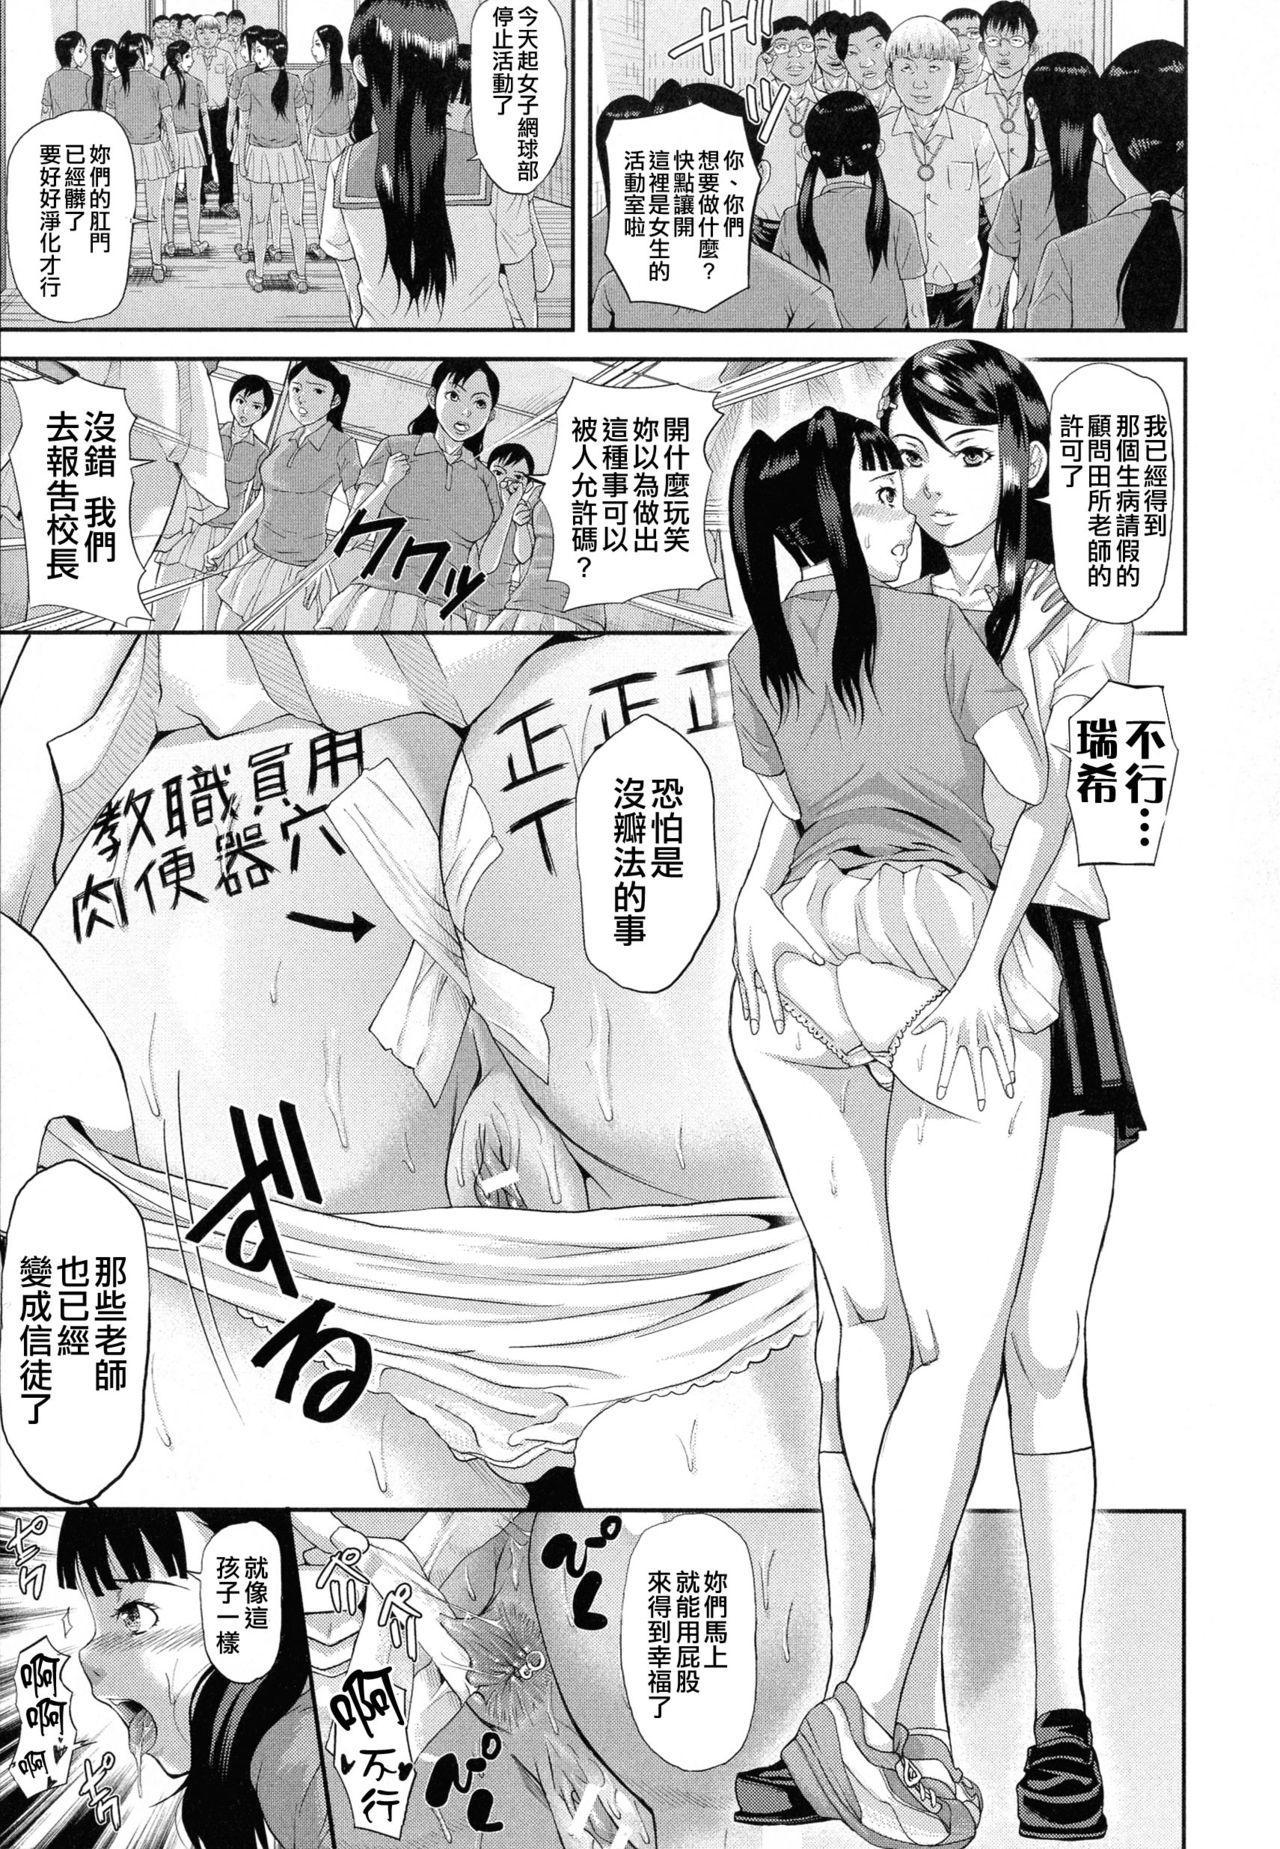 [Honebuto Danshaku] Innou Kaizou Program ~Oyako Zecchou Cult Ochi~ [Chinese]【不想记名重嵌--高质量图源】 177